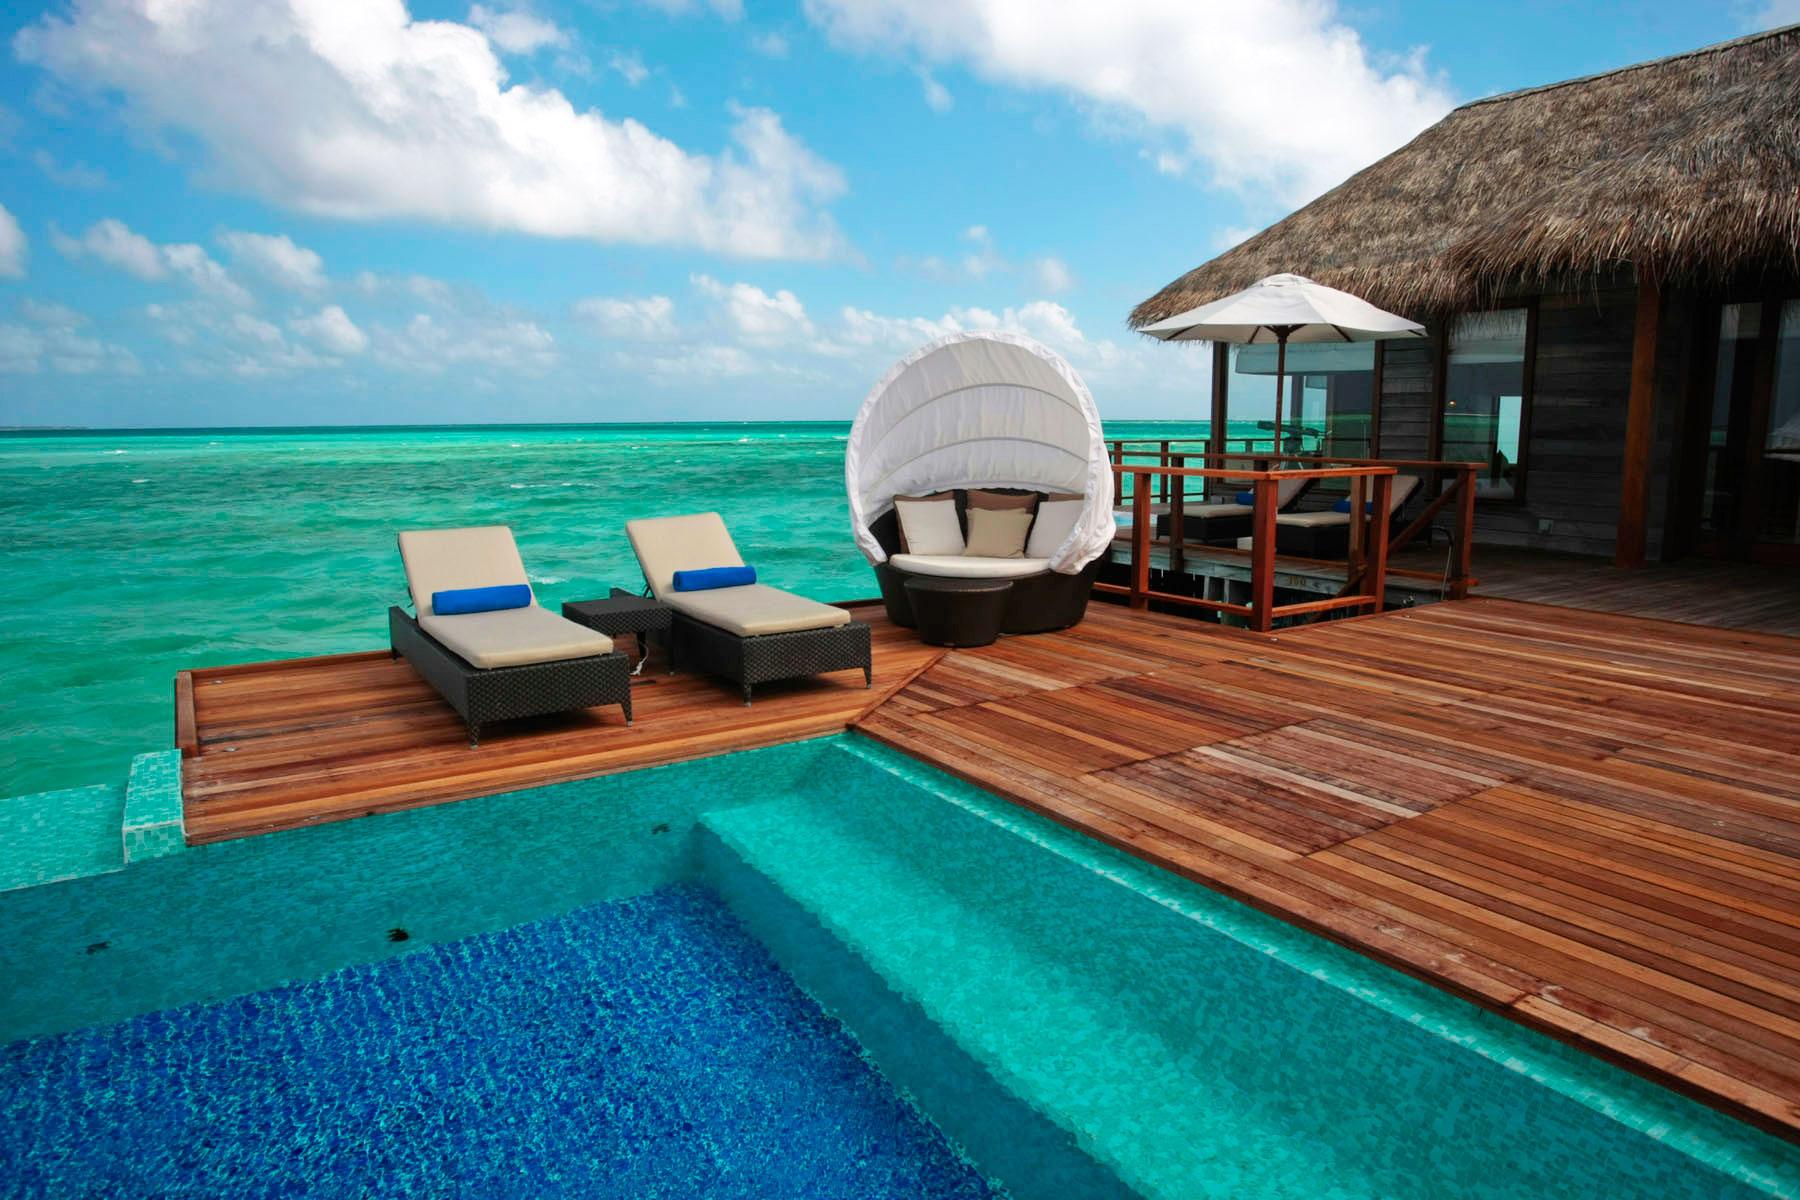 5 Star Conrad Resort In Rangali Island Maldives Interiors Inside Ideas Interiors design about Everything [magnanprojects.com]